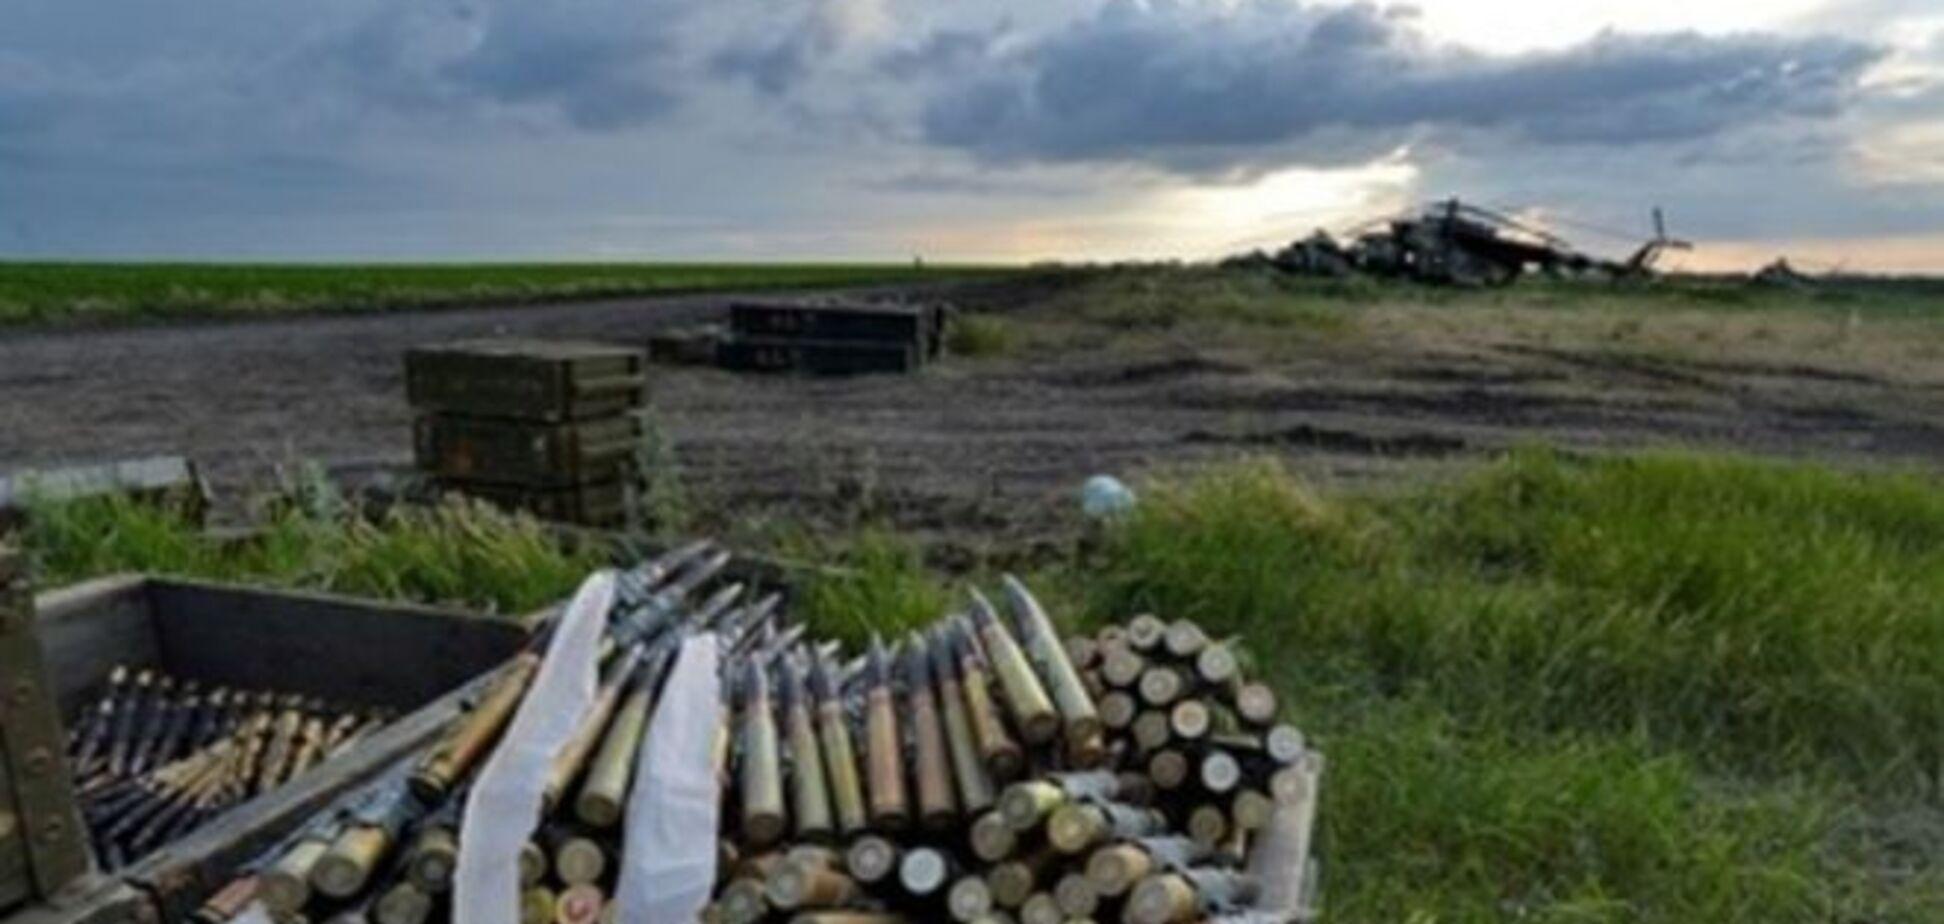 Три спецназовца подорвались на гранате в Луганской области